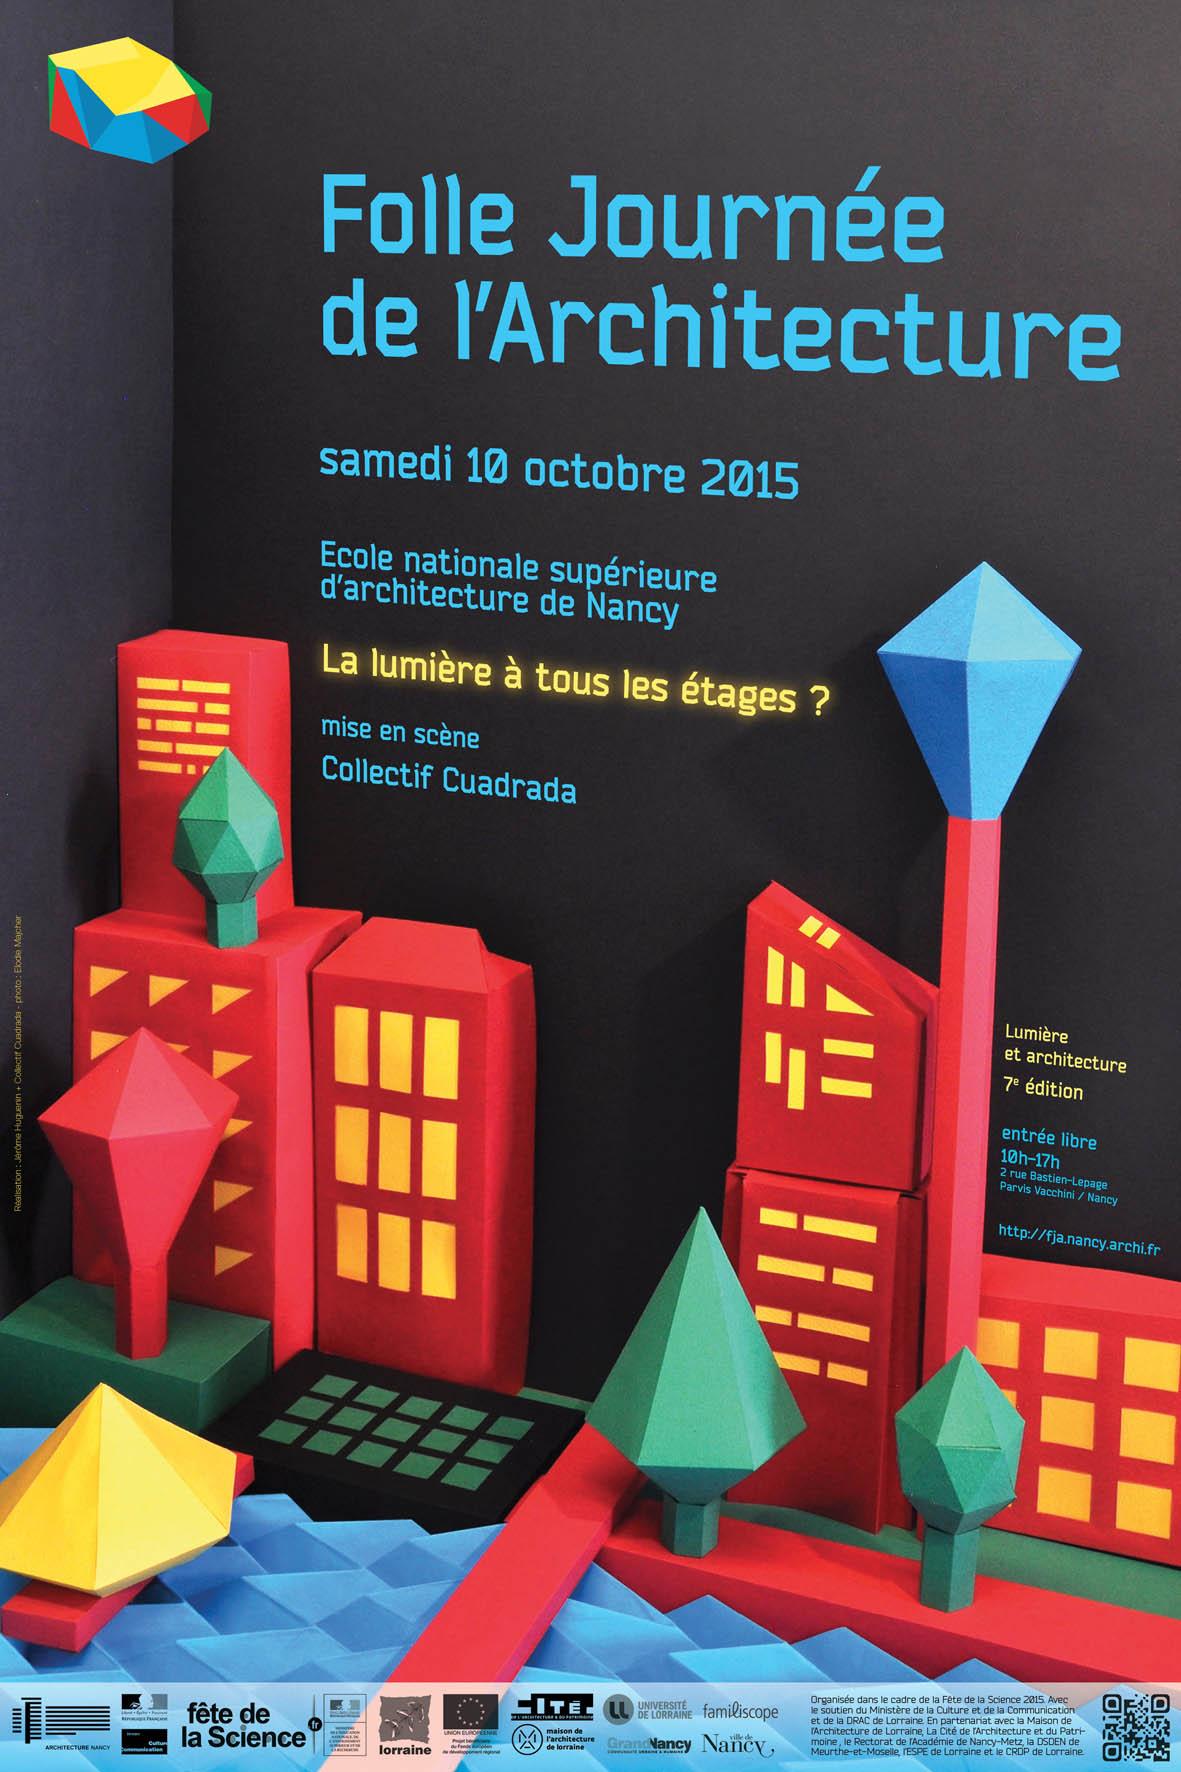 Fja 2015 folle journ e de l 39 architecture culture architecturale - Journee de l architecture ...